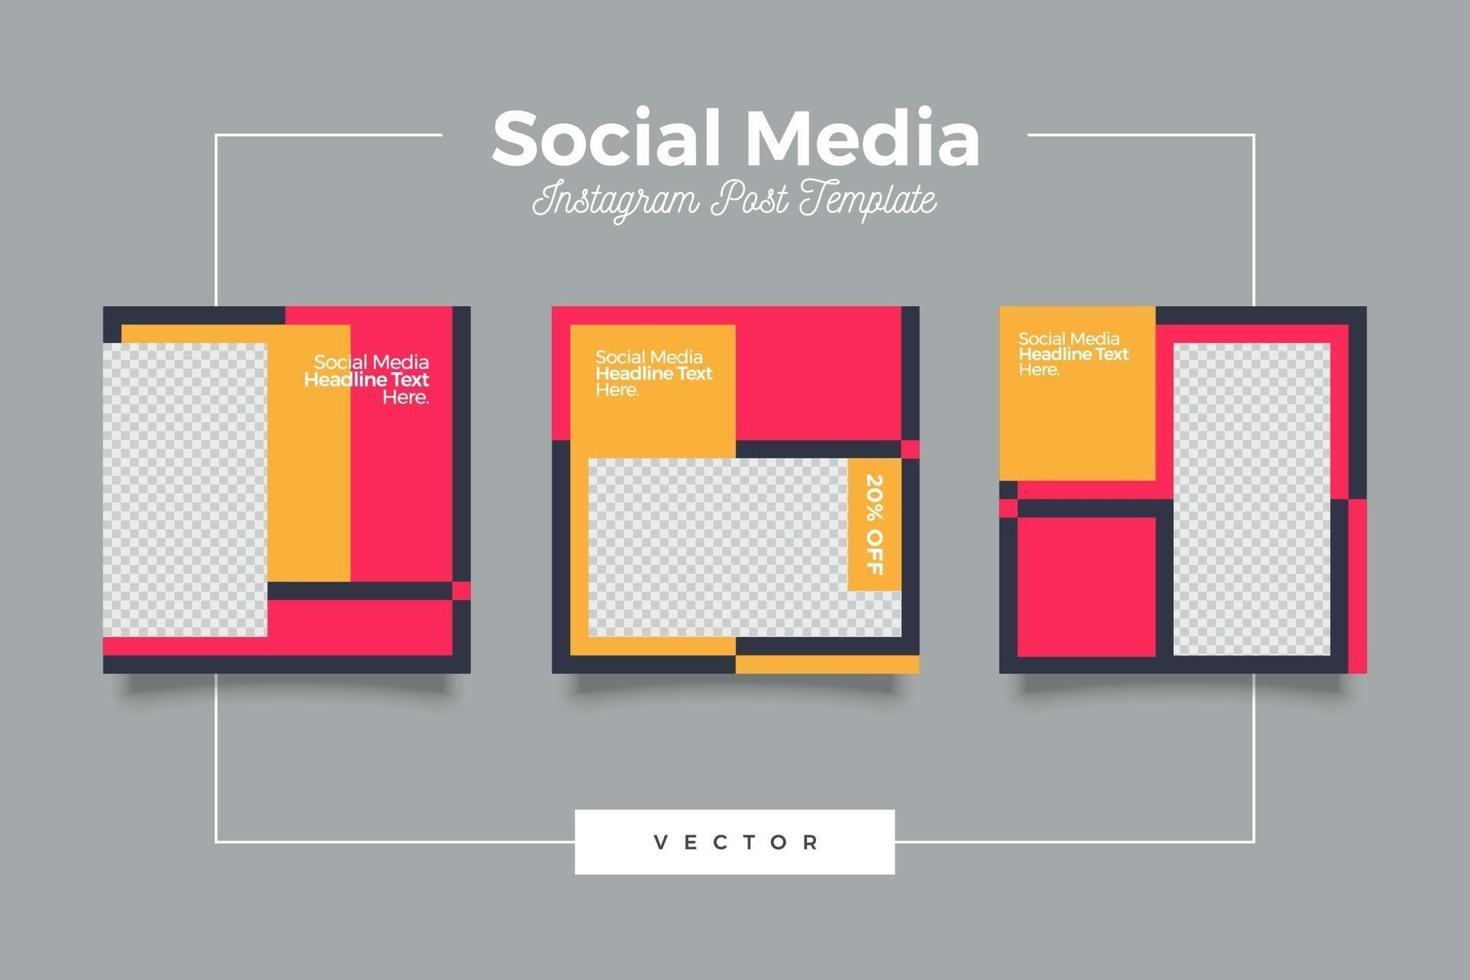 mode moderna sociala medier post banderoll vektor